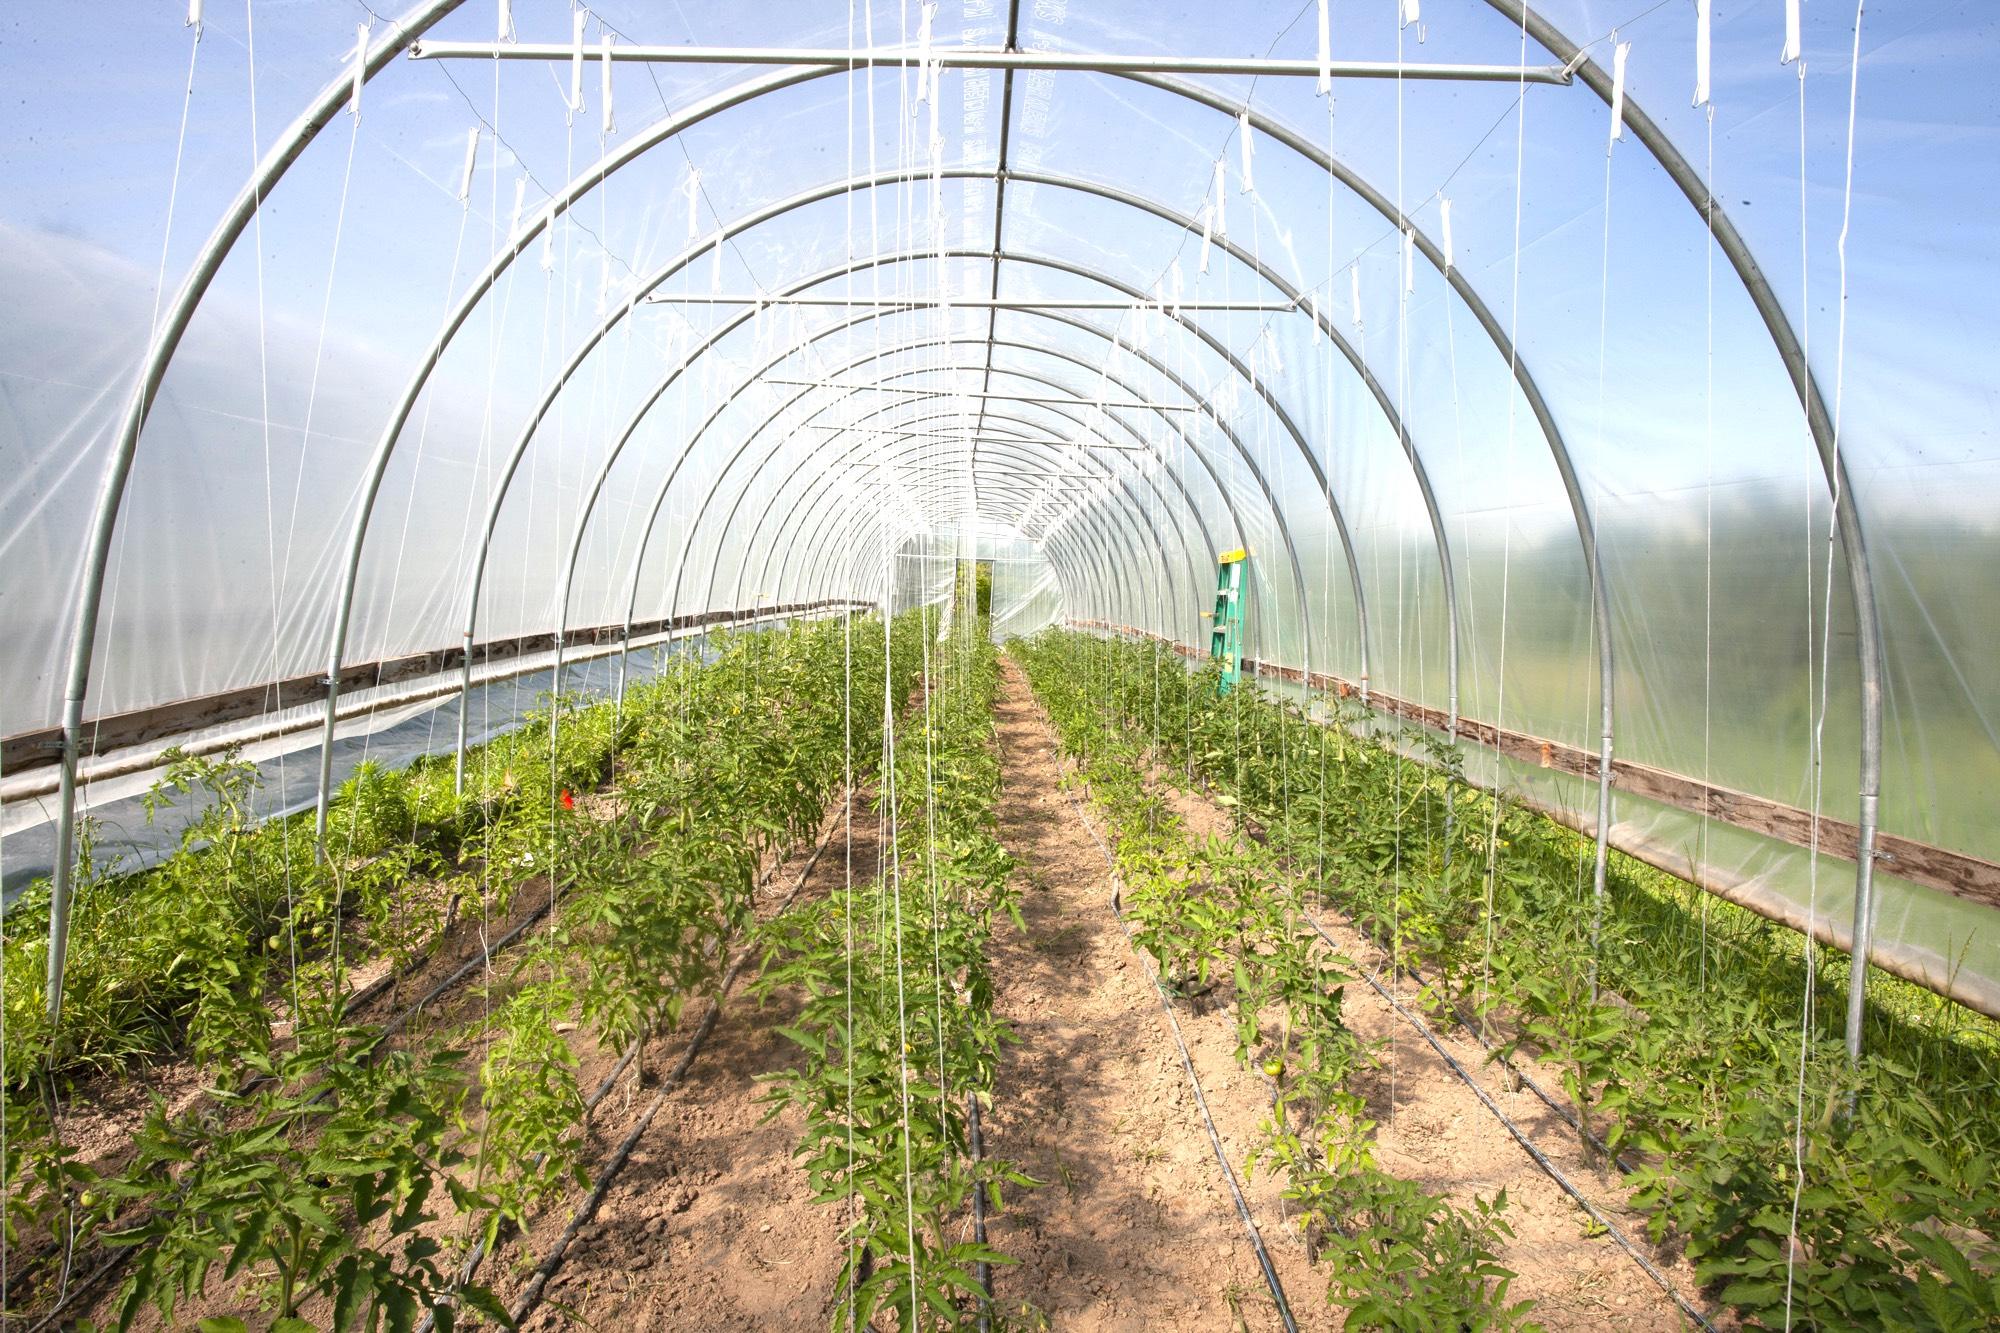 The tomato greenhouse at Avrom Farm.